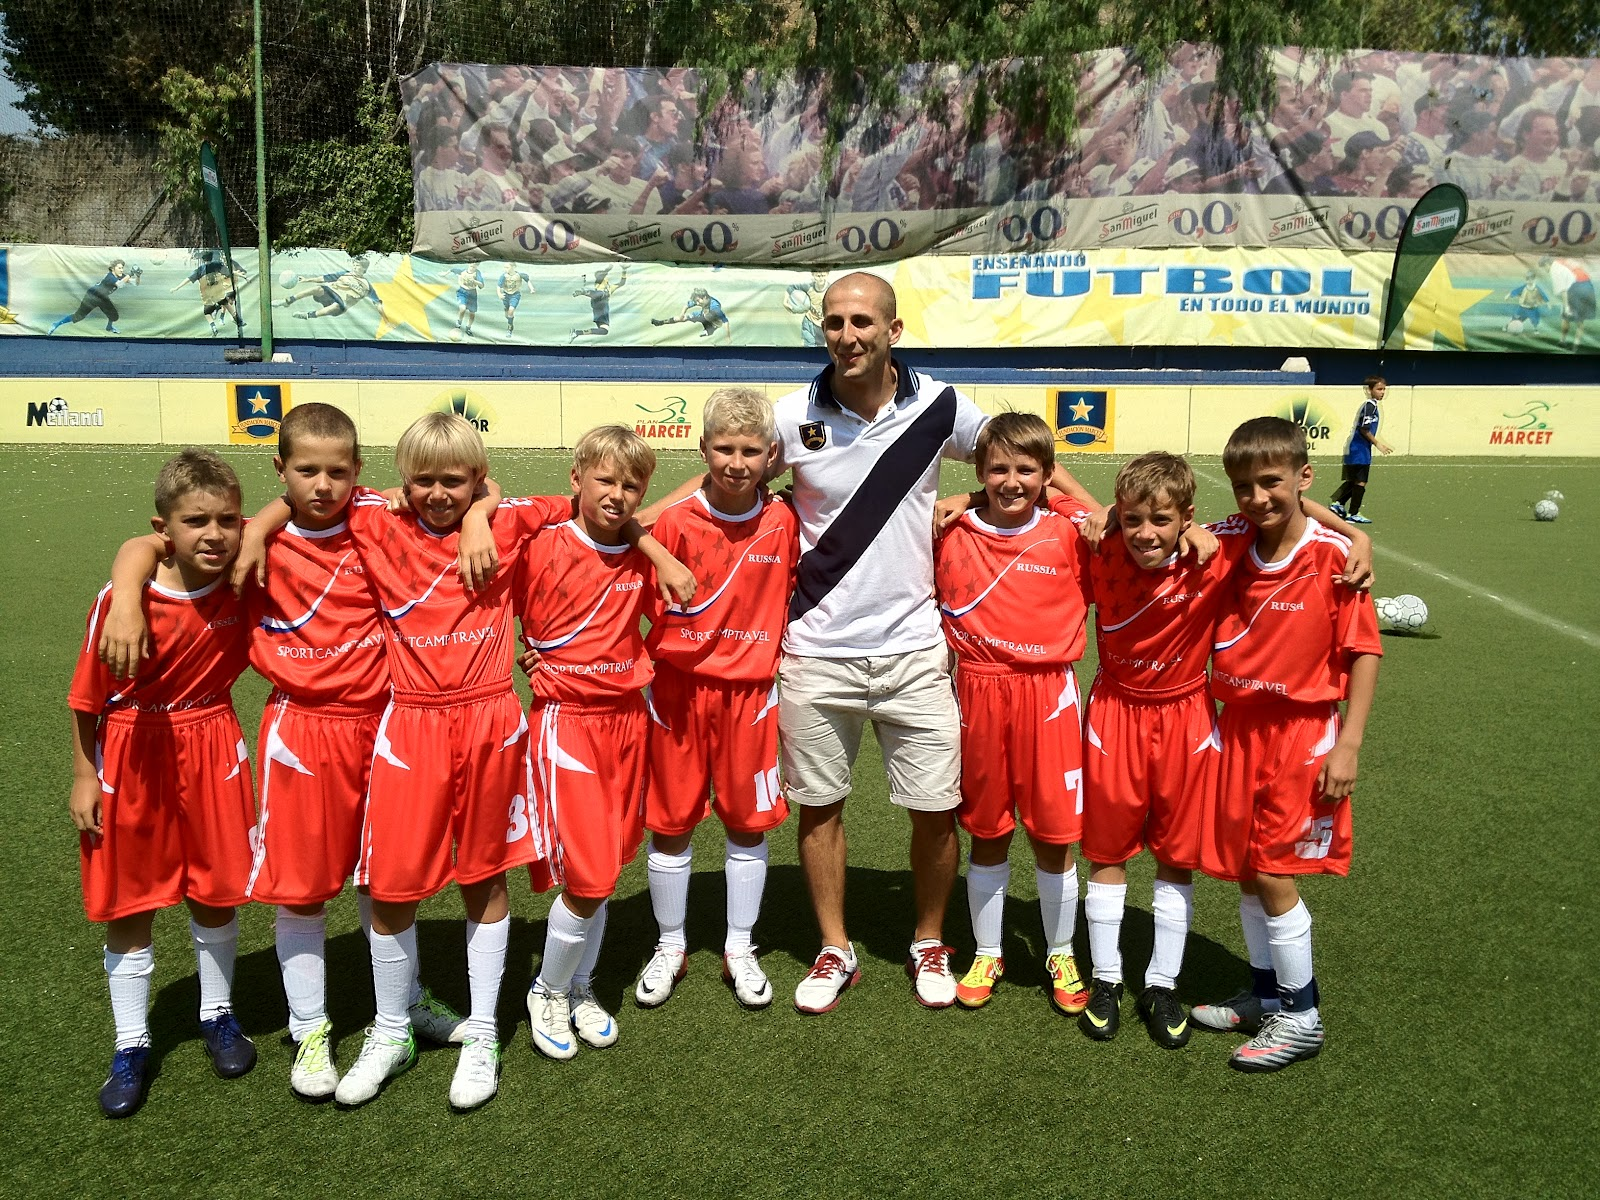 SportCampTravel Sponsored Team at the European Junior Championships in Barcelona